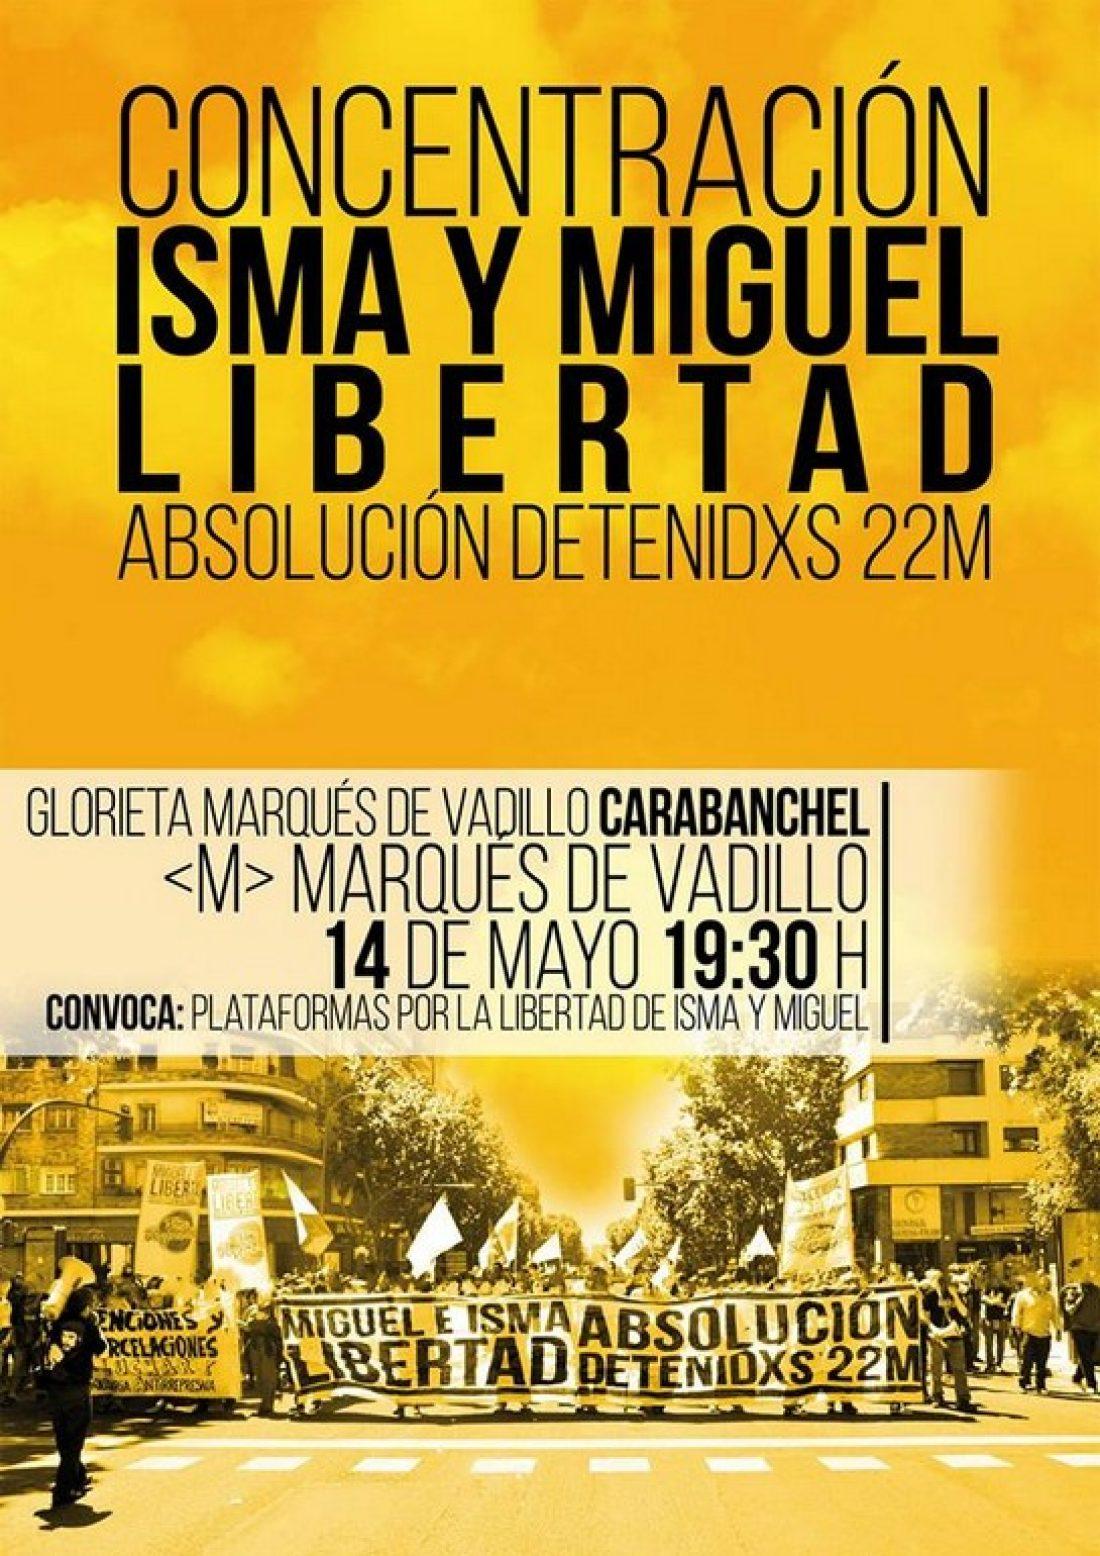 CGT apoya a Miguel e Isma